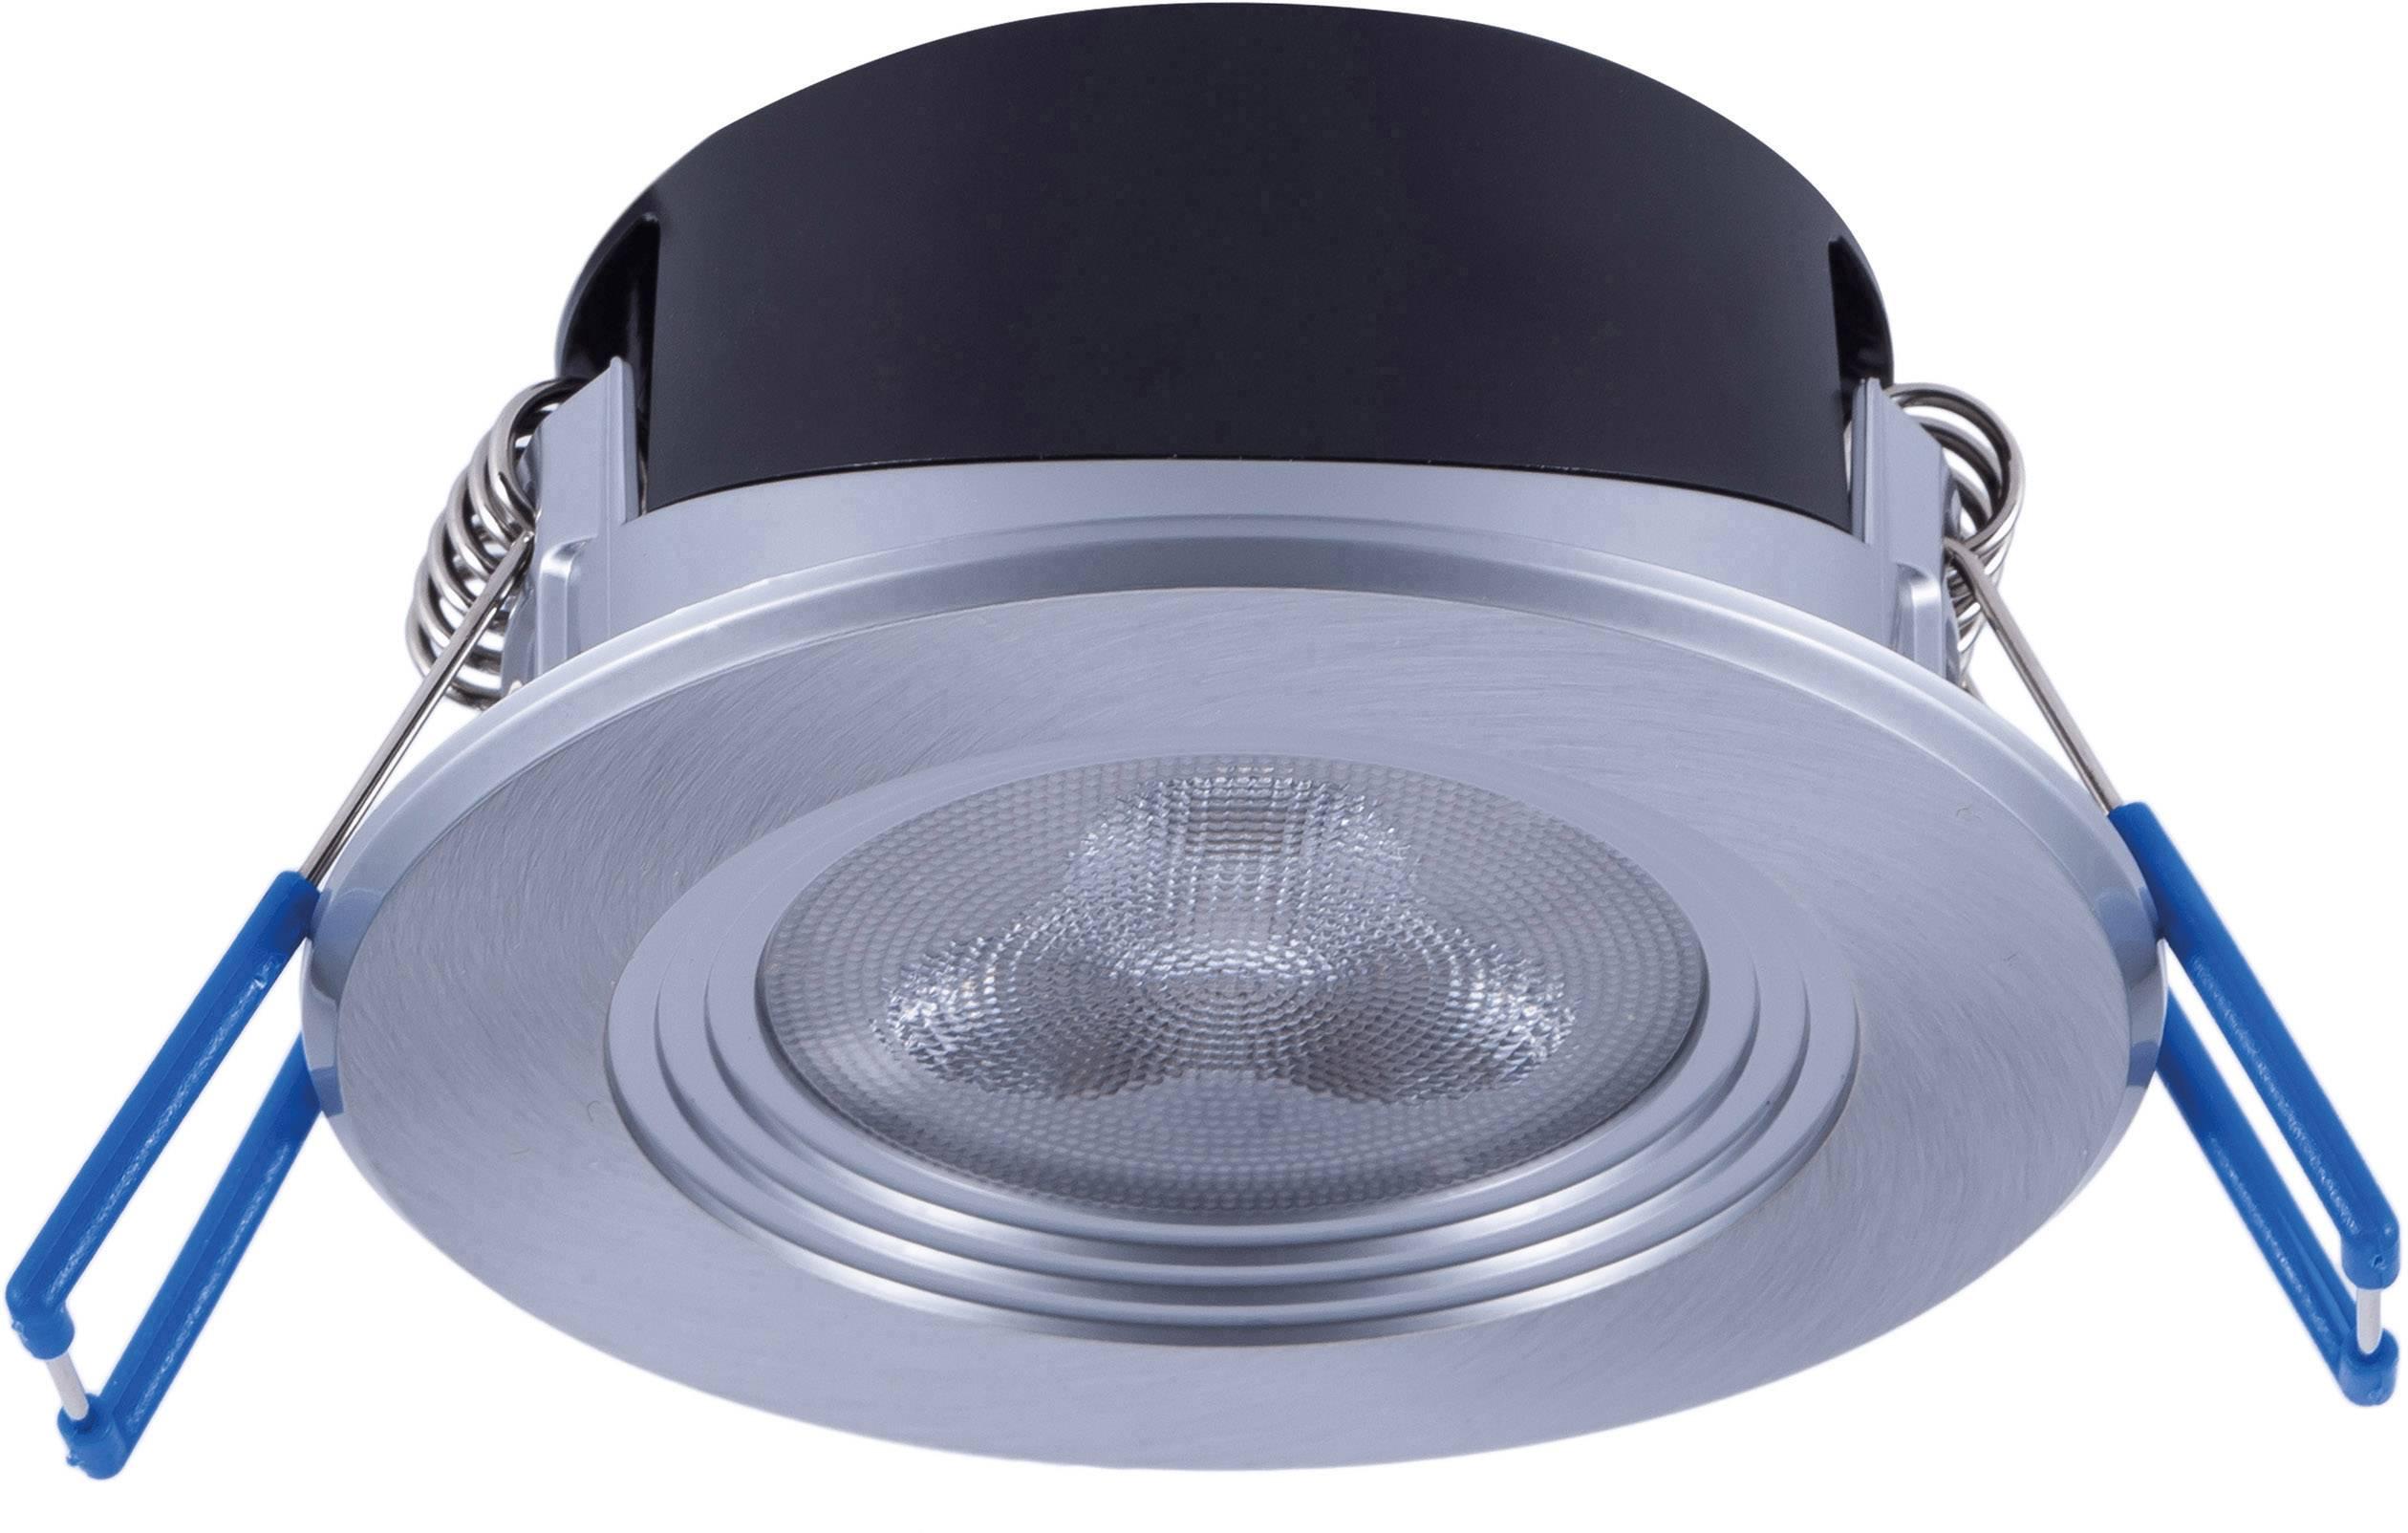 Lampada LED da incasso 7 W Bia